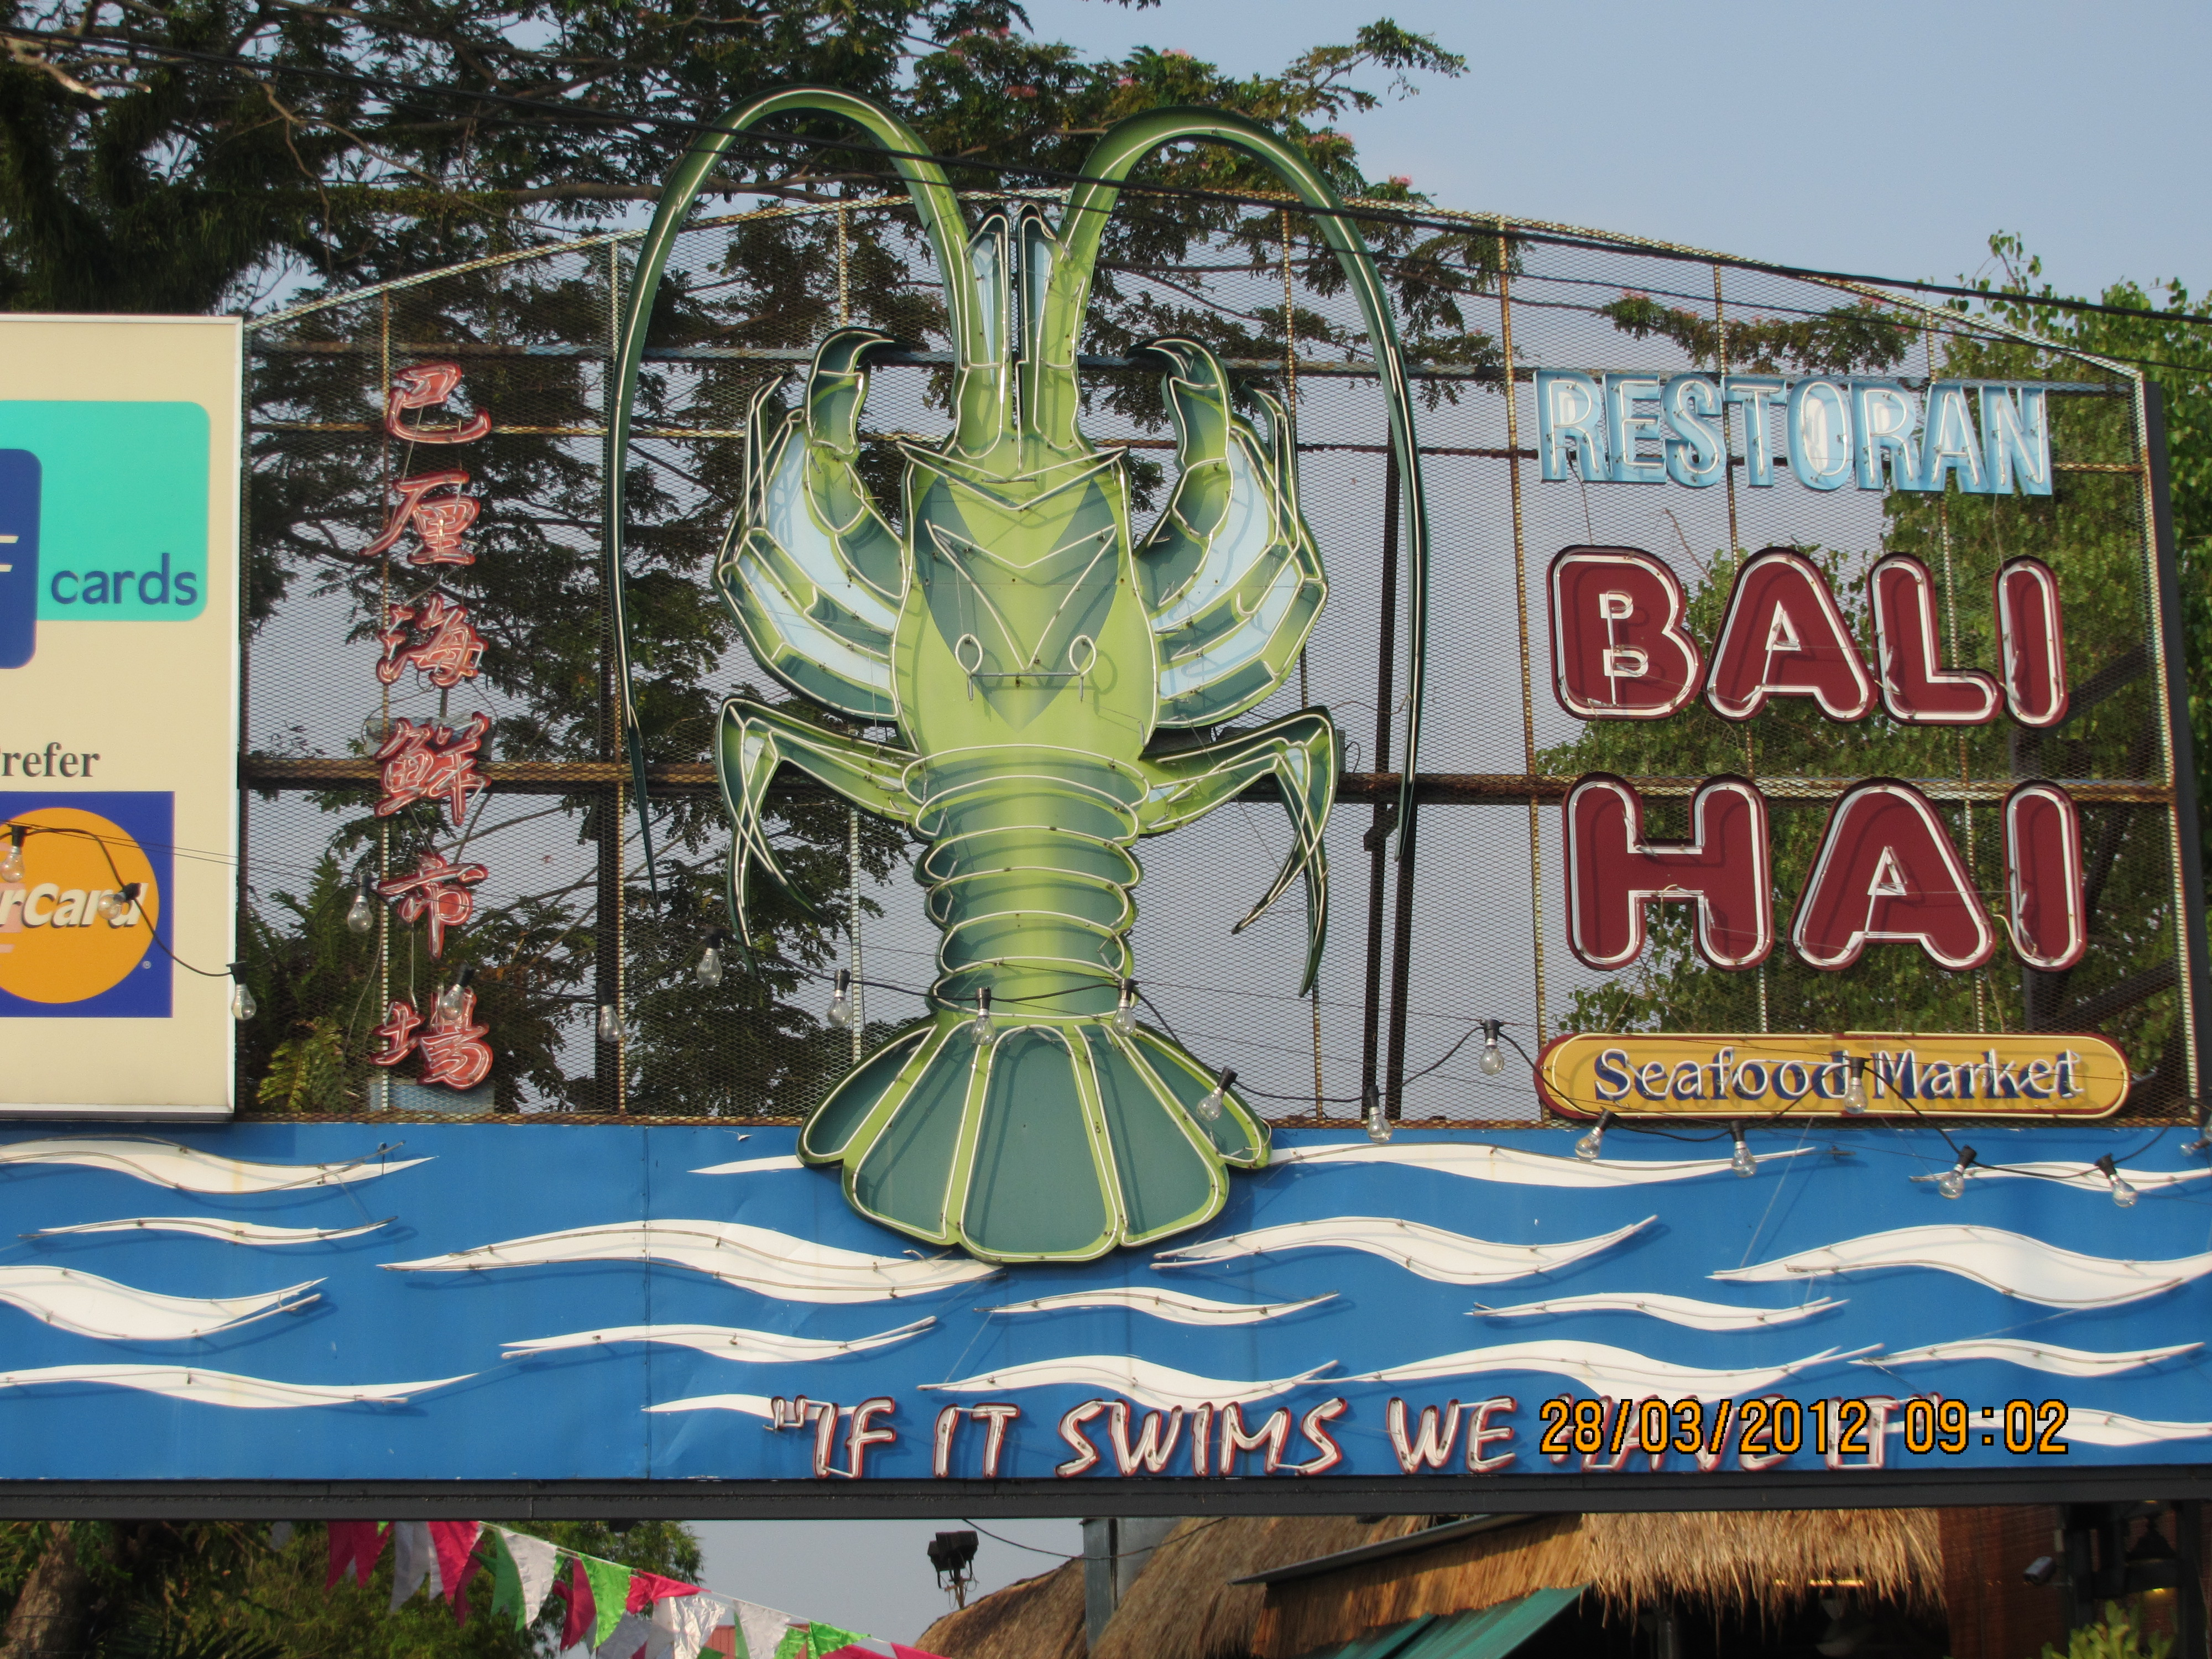 Penang Dim Sum Yum A Visit To Bali Hai Tropical Expat